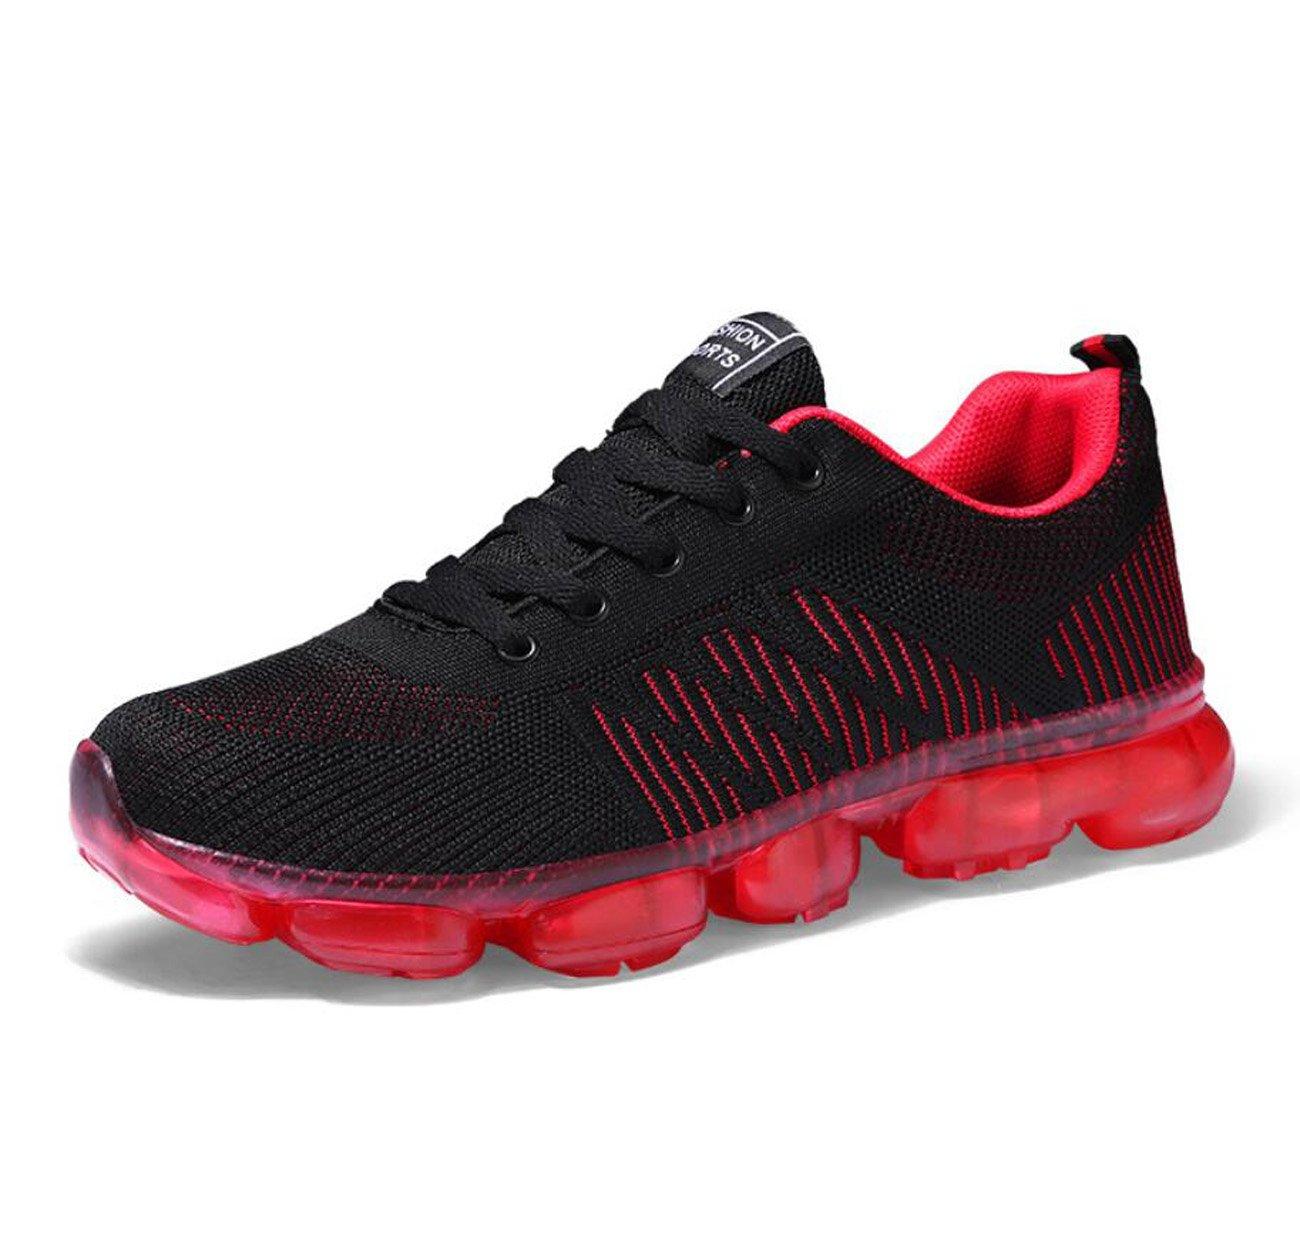 Zapatillas de running para hombre Spring Light Transpirable completo Palm Cushion Shock Absorber Running Shoes Korean Wild Sports Shoes ( Color : Rojo , tamaño : 44 ) 44 Rojo